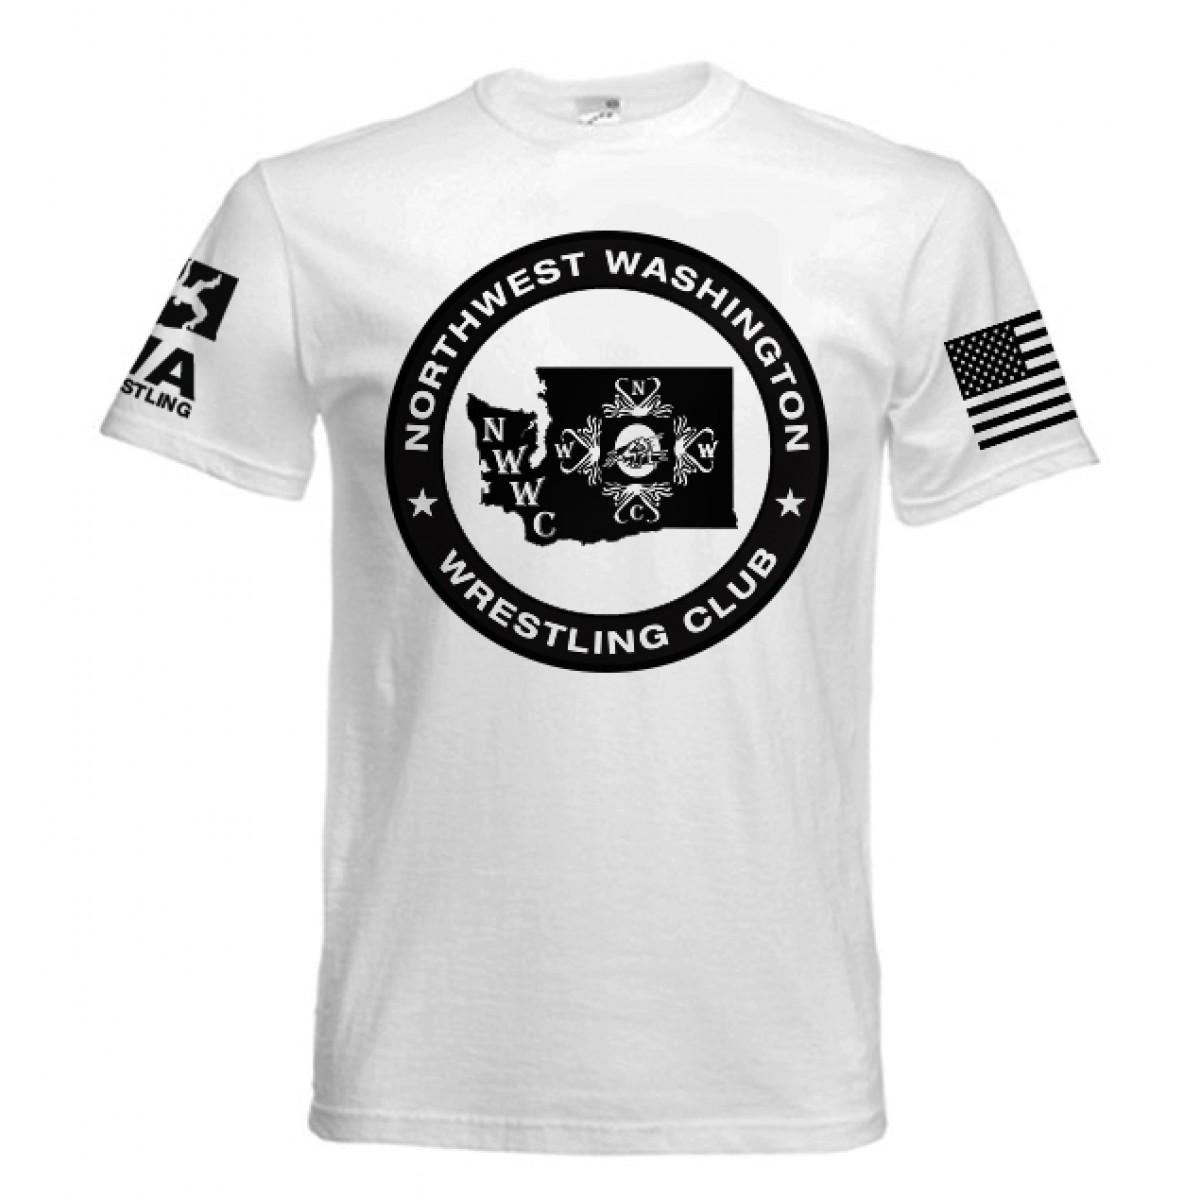 NWWC White T-shirt Black Logo-White-YL